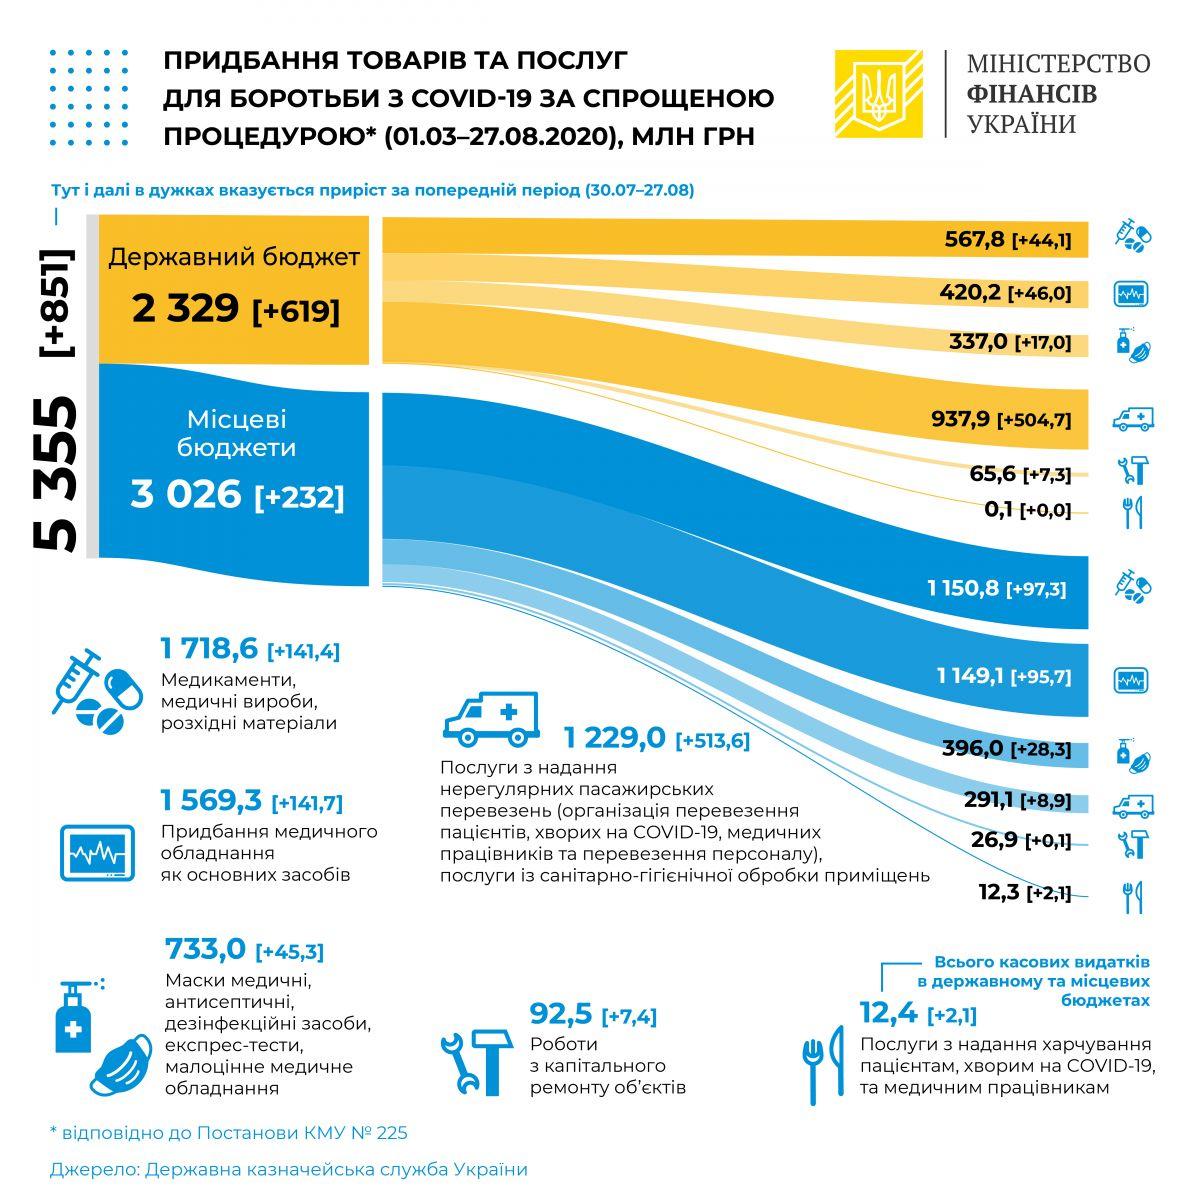 Борьба с COVID-19: Украина потратила на